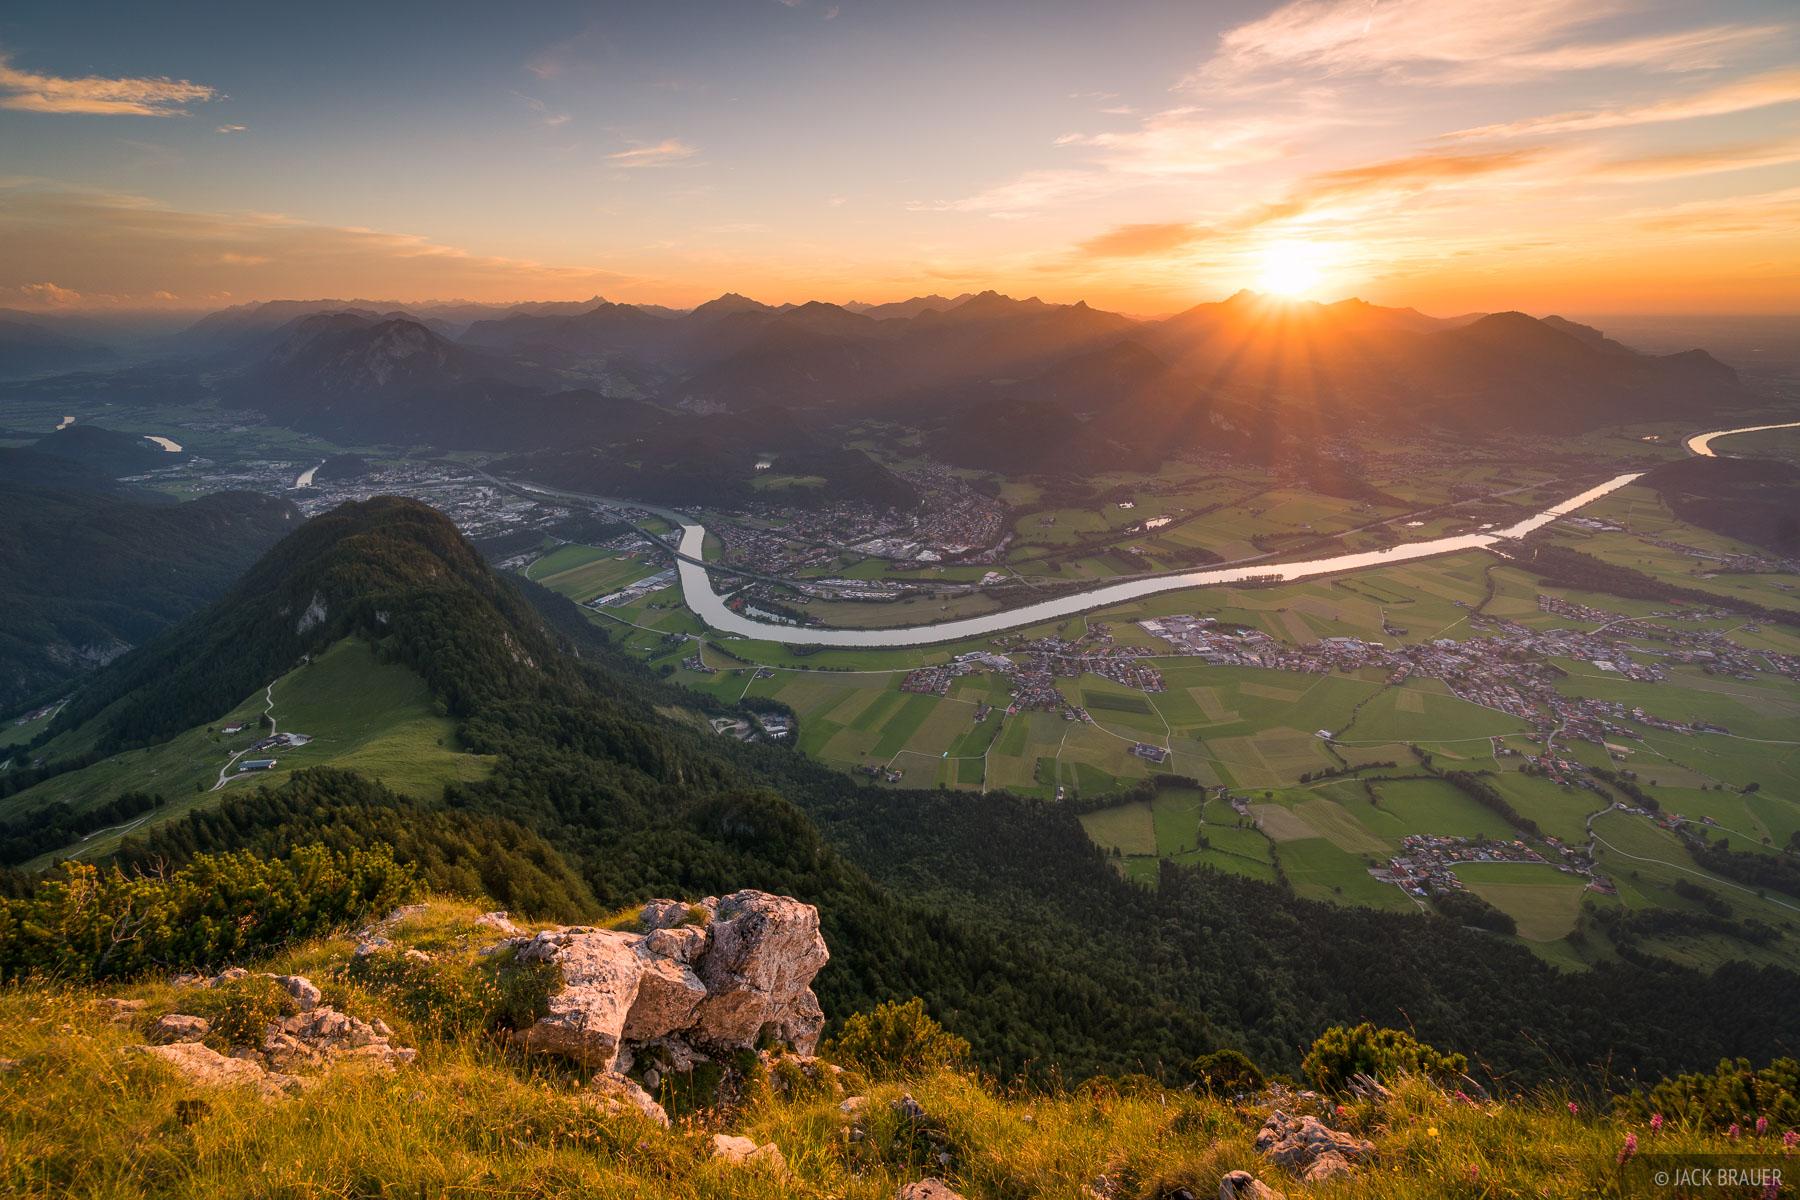 Austria, Kaisergebirge, Naunspitze, sunset, Inn River, Kufstein, photo